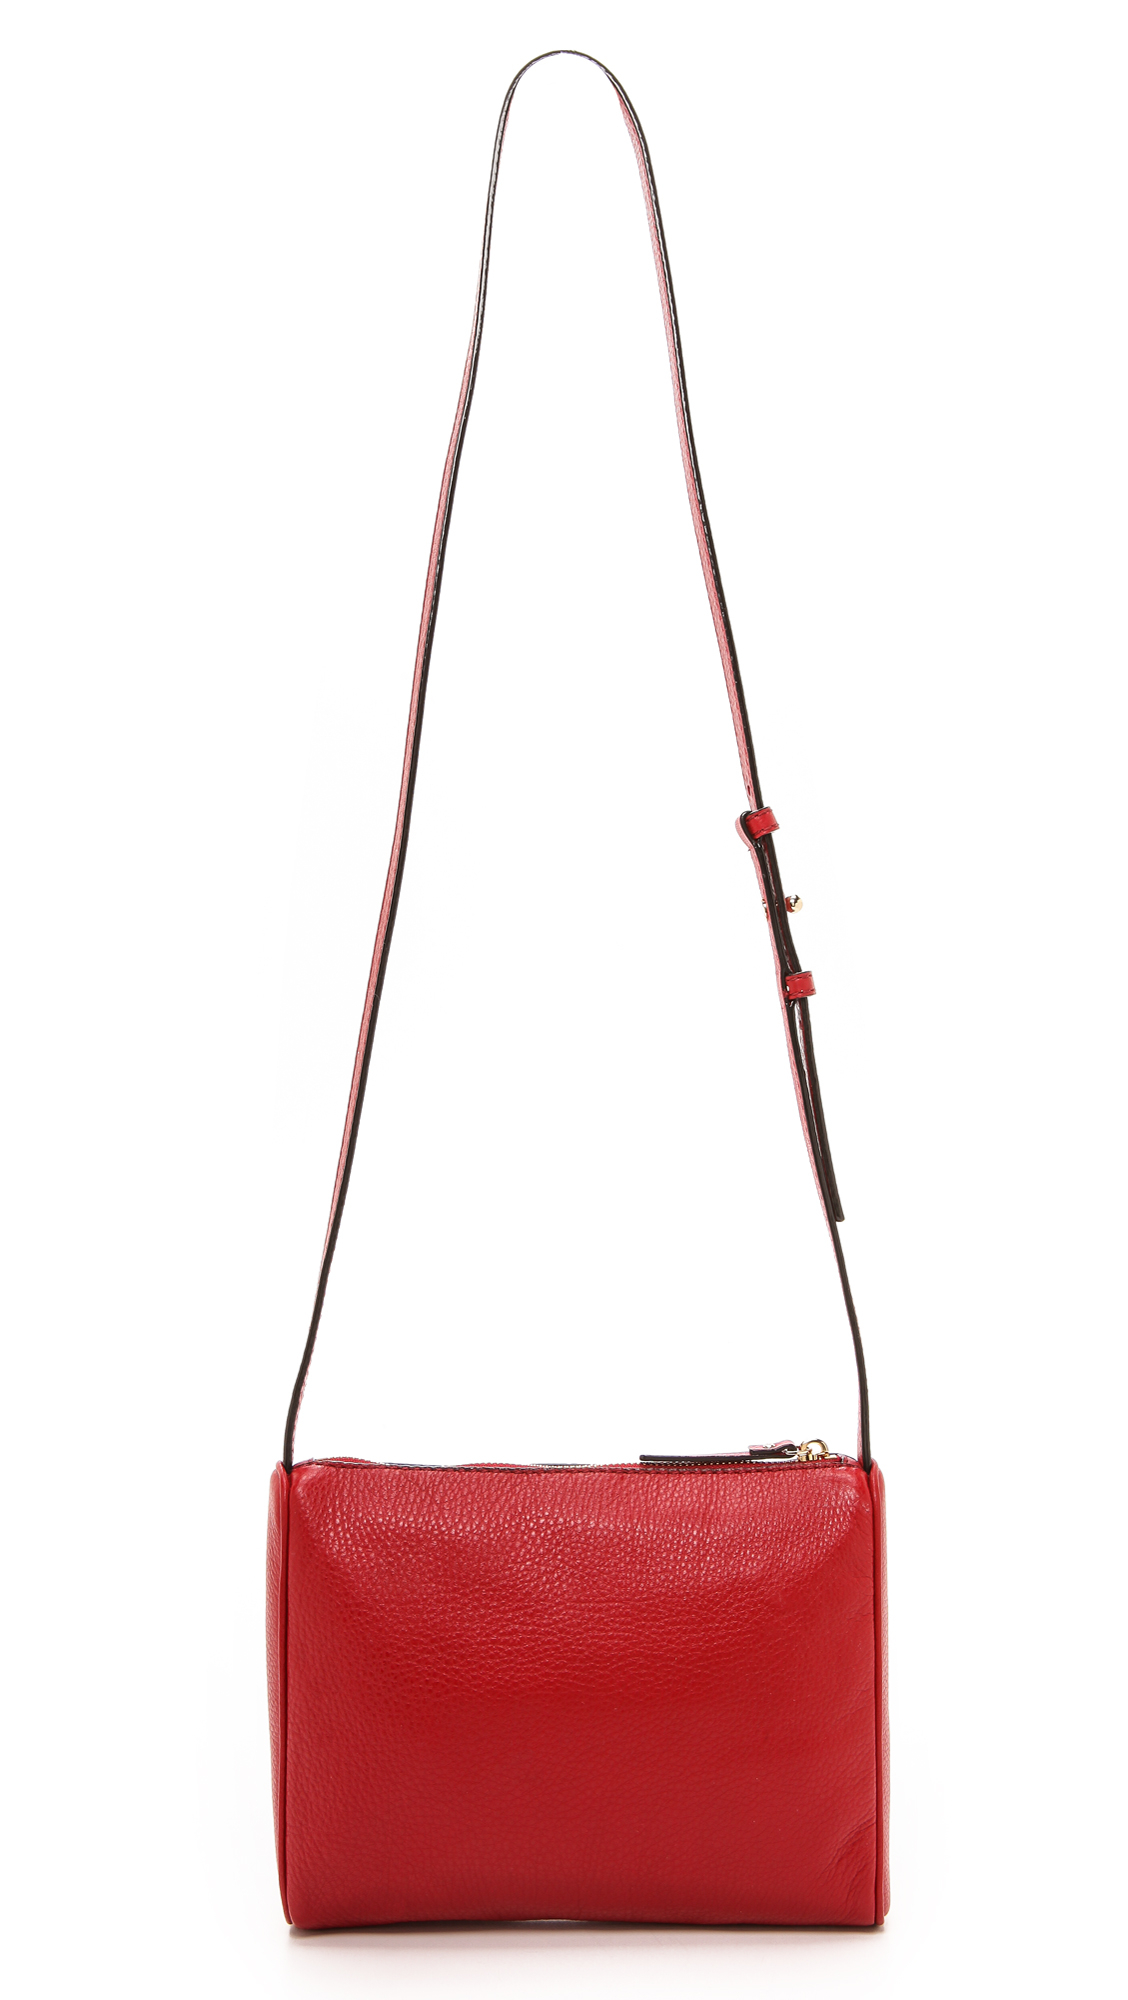 Kate Spade Cayli Cross Body Bag - Black in Red